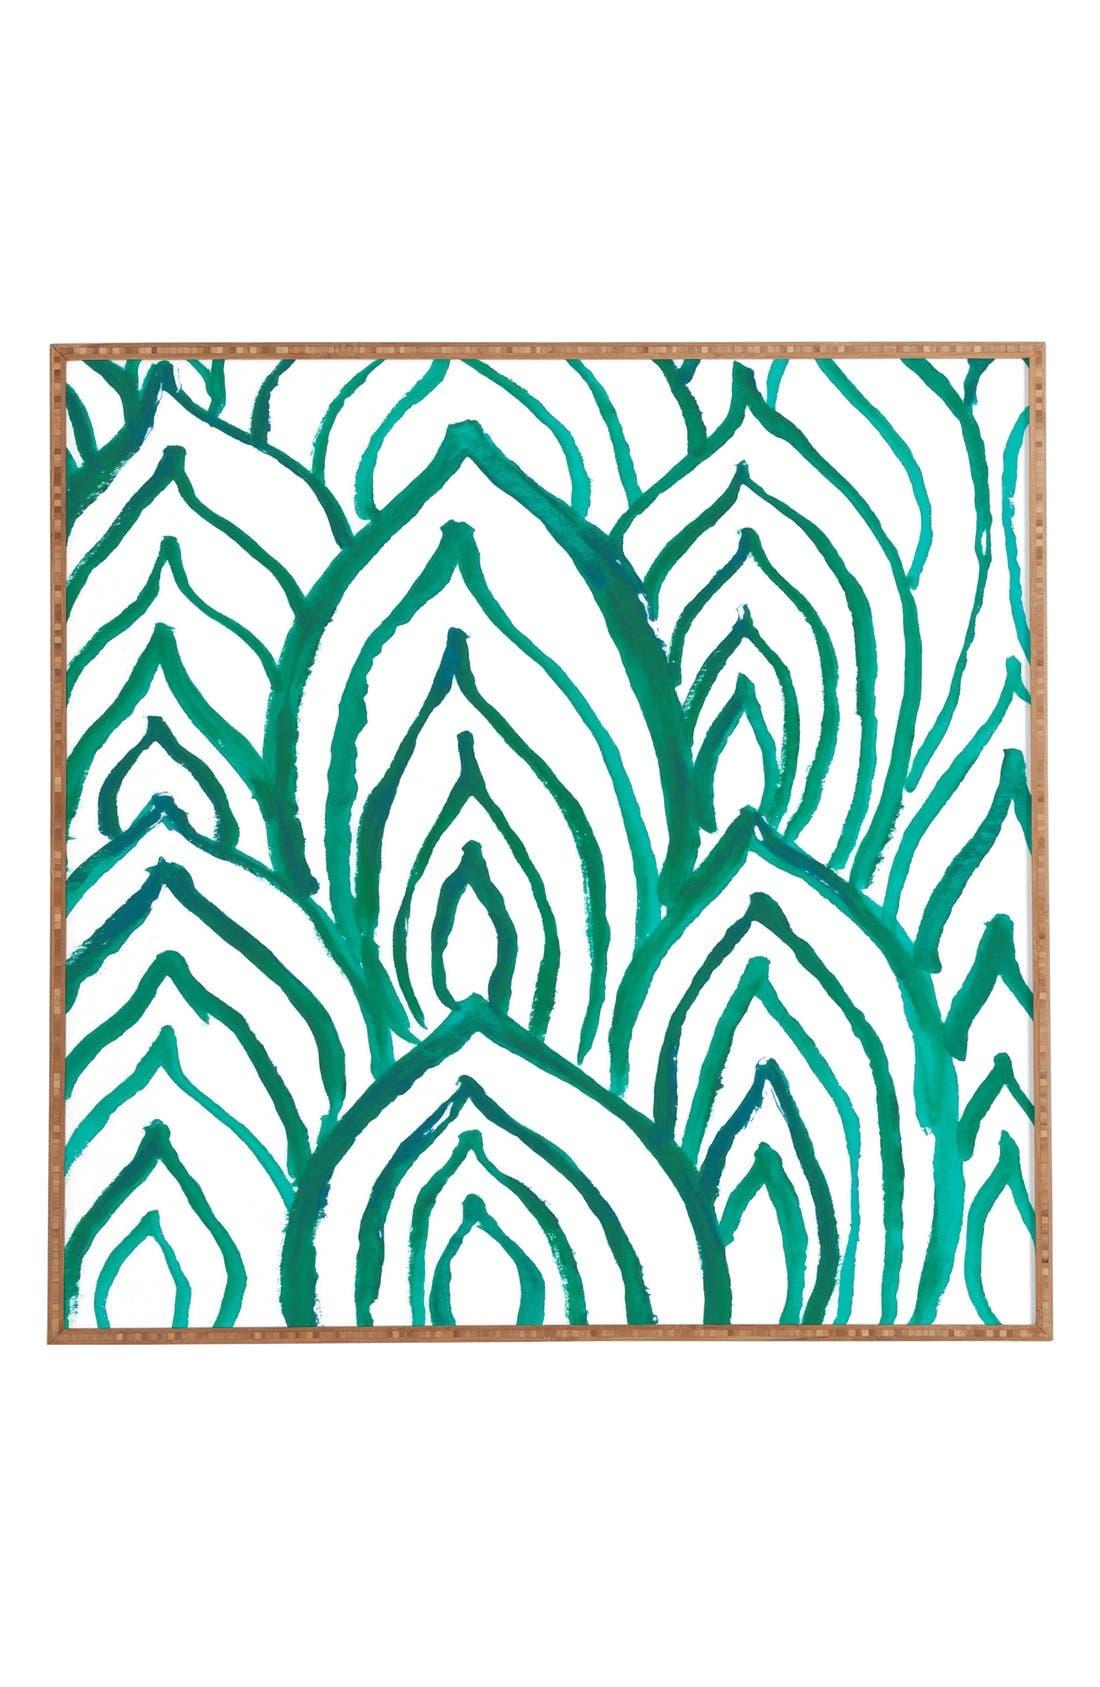 DENY DESIGNS, 'Emerald Coast' Framed Wall Art, Alternate thumbnail 2, color, 300